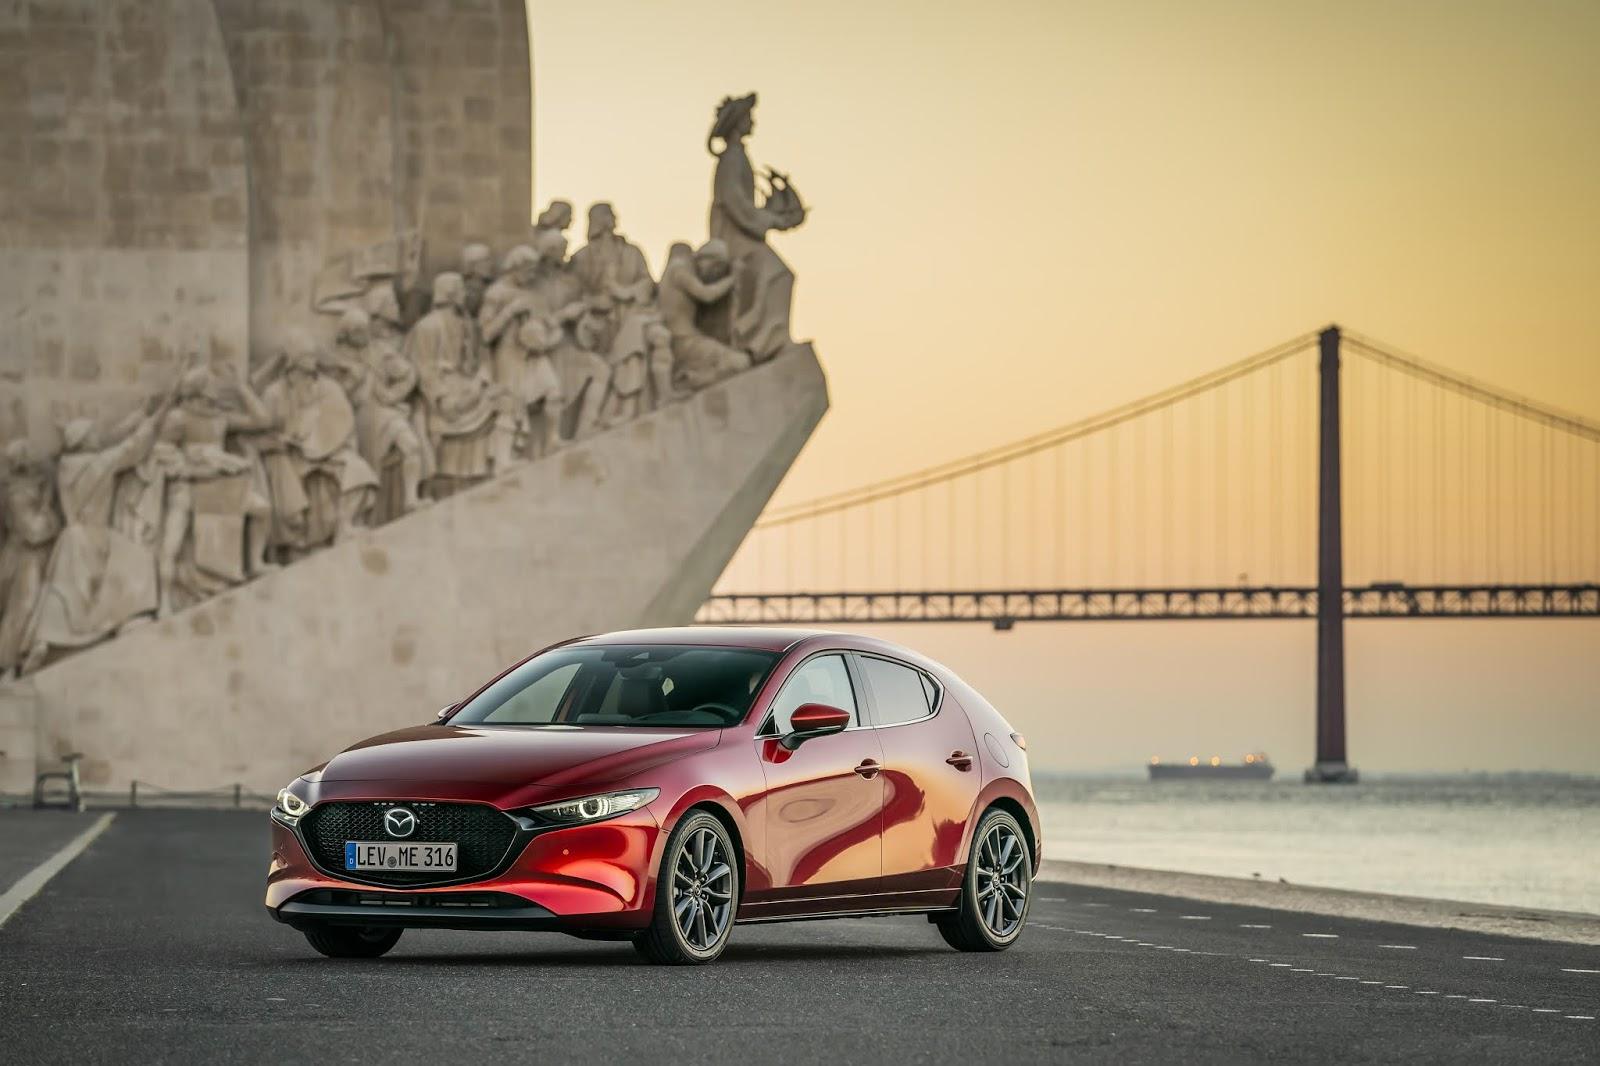 Mazda3 HB SoulRedCrystal Still 12 Ήρθε στην Ελλάδα το νέο Mazda3 με τον 1,5λιτρο των 120 ίππων